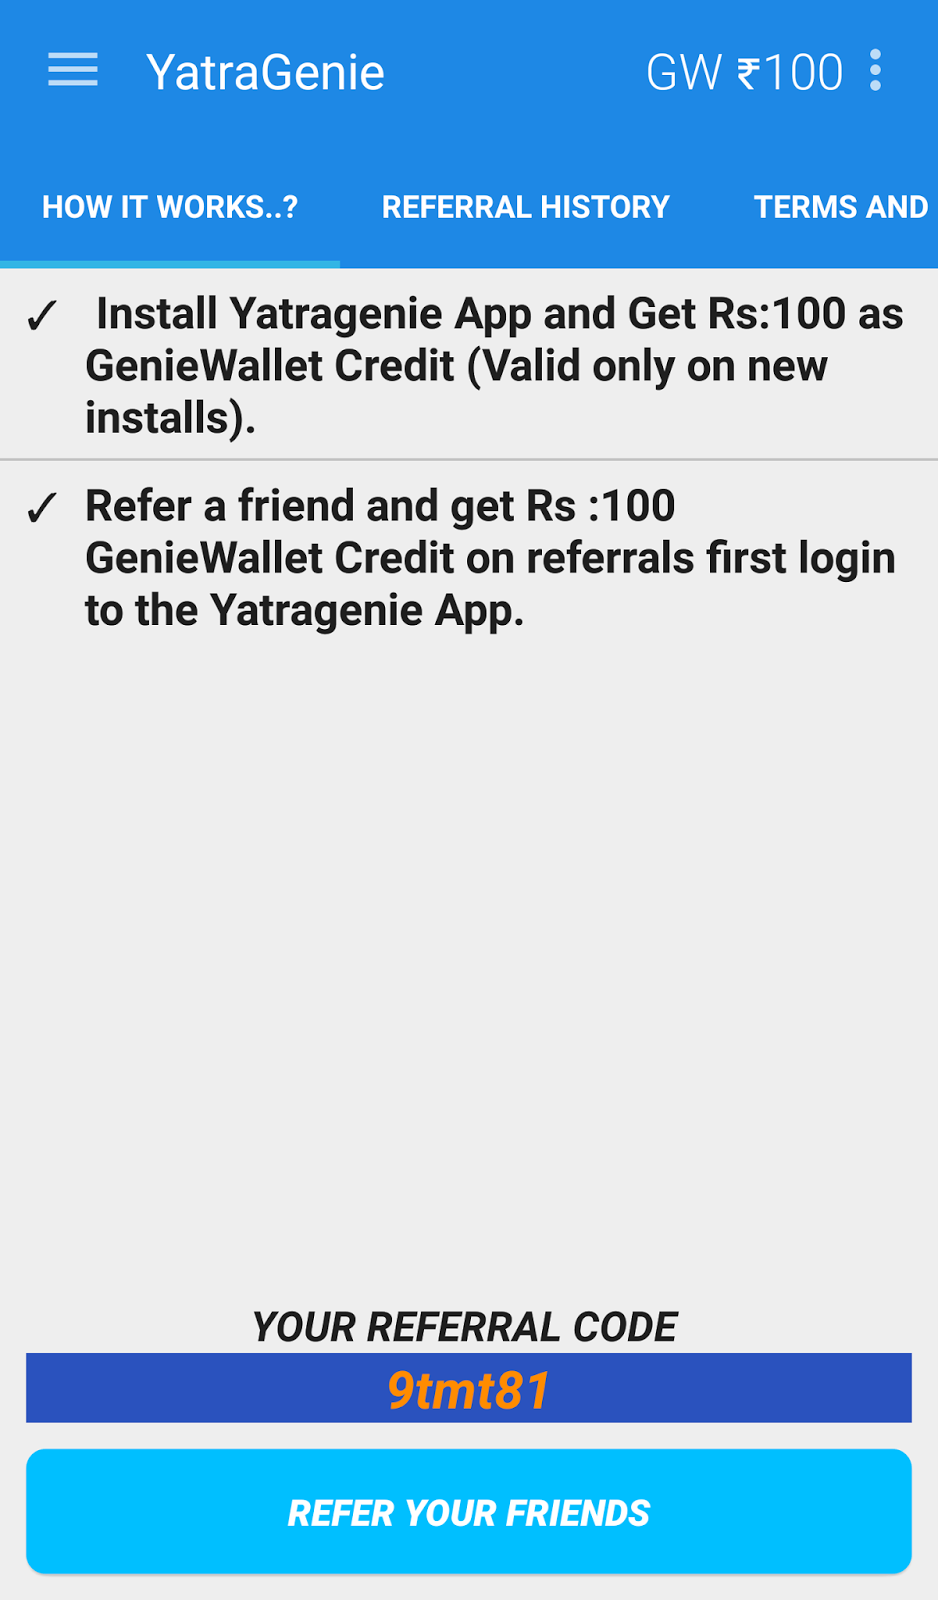 Yatragenie coupons today